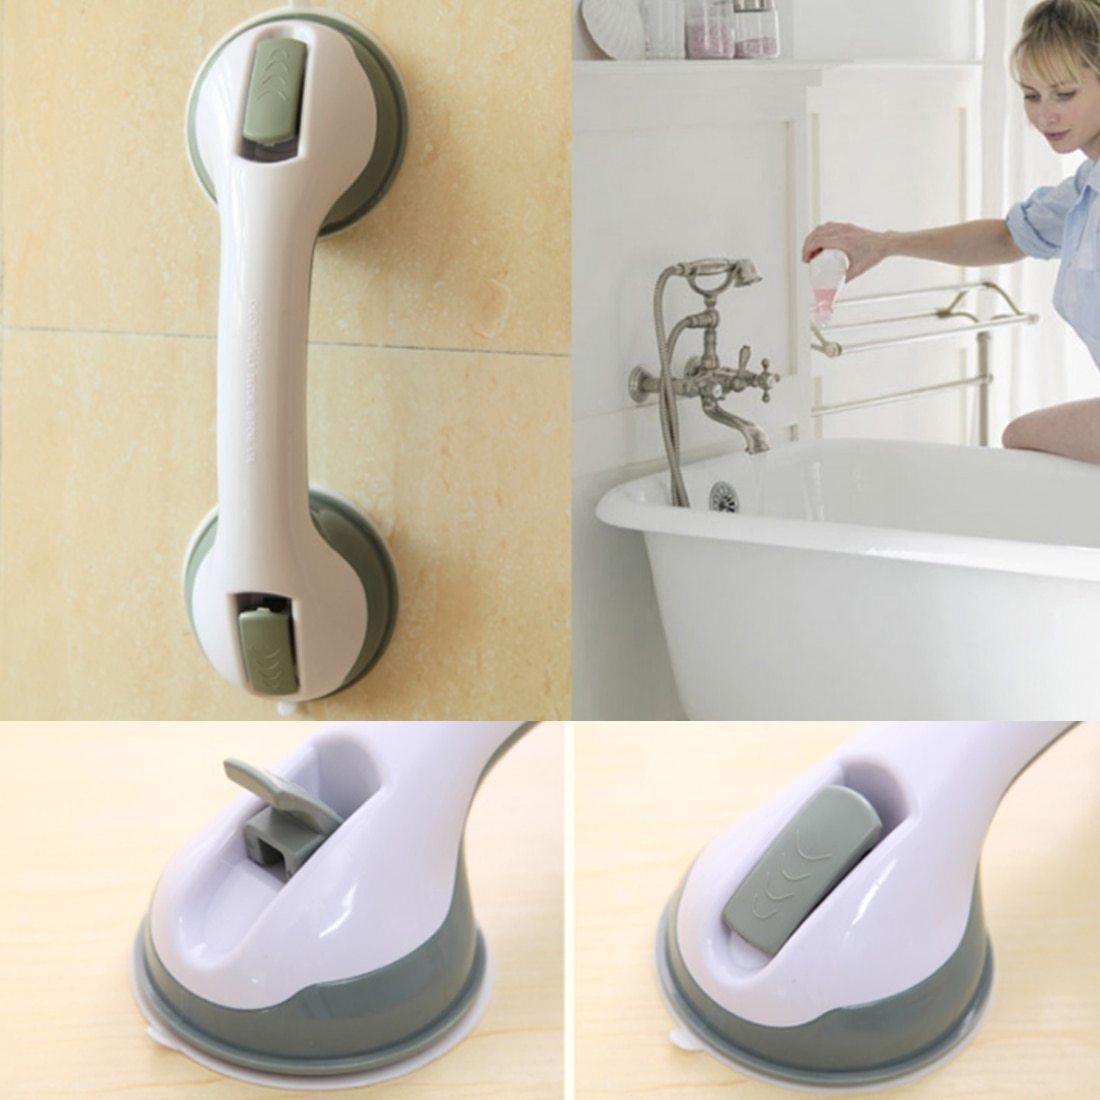 Anti slip shower grip grab bars in bathroom shower tub